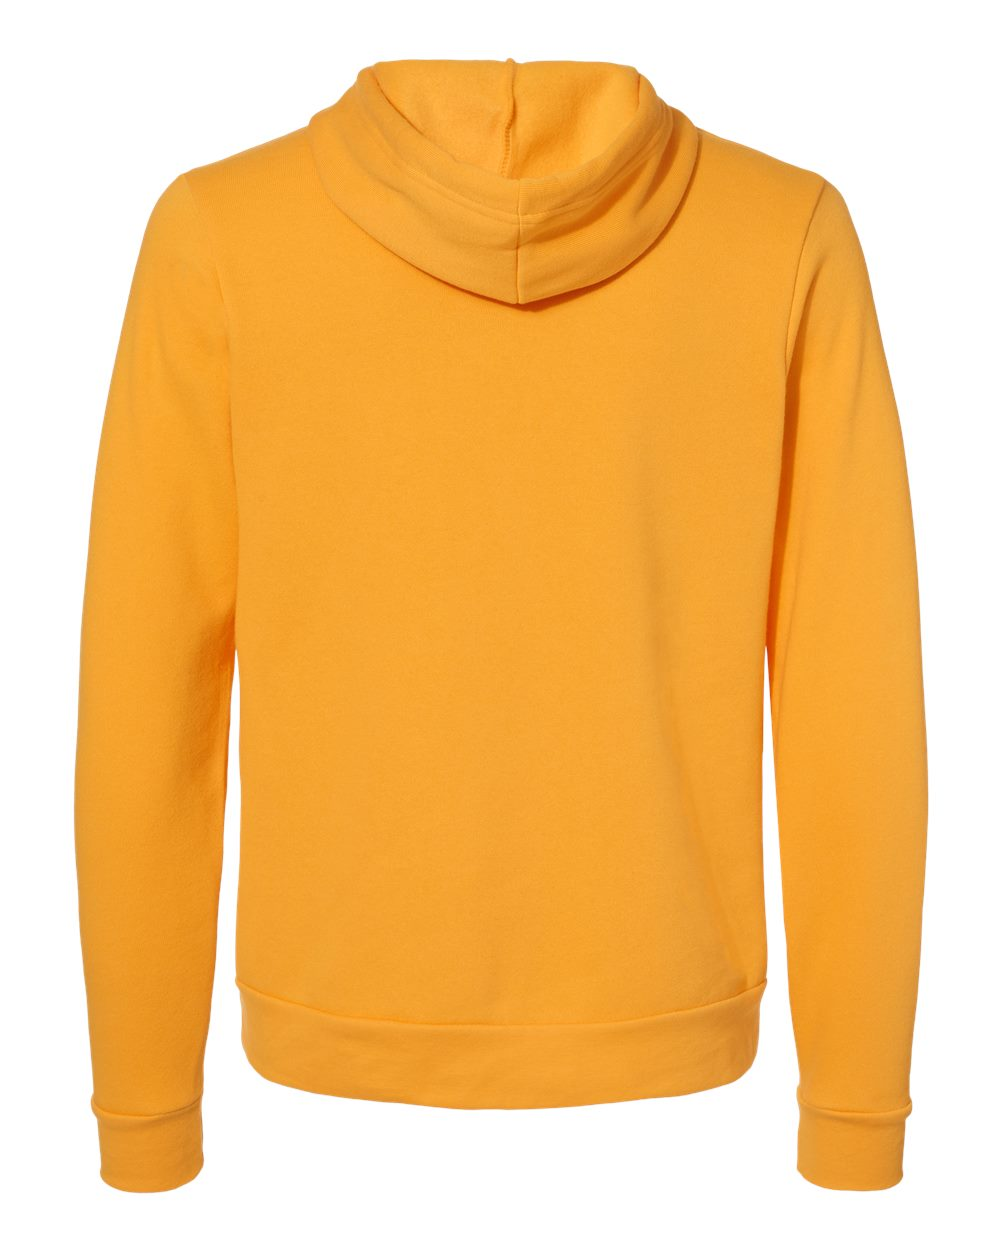 Bella-Canvas-Unisex-Sponge-Hooded-Pullover-Sweatshirt-Blank-3719-up-to-2XL thumbnail 39